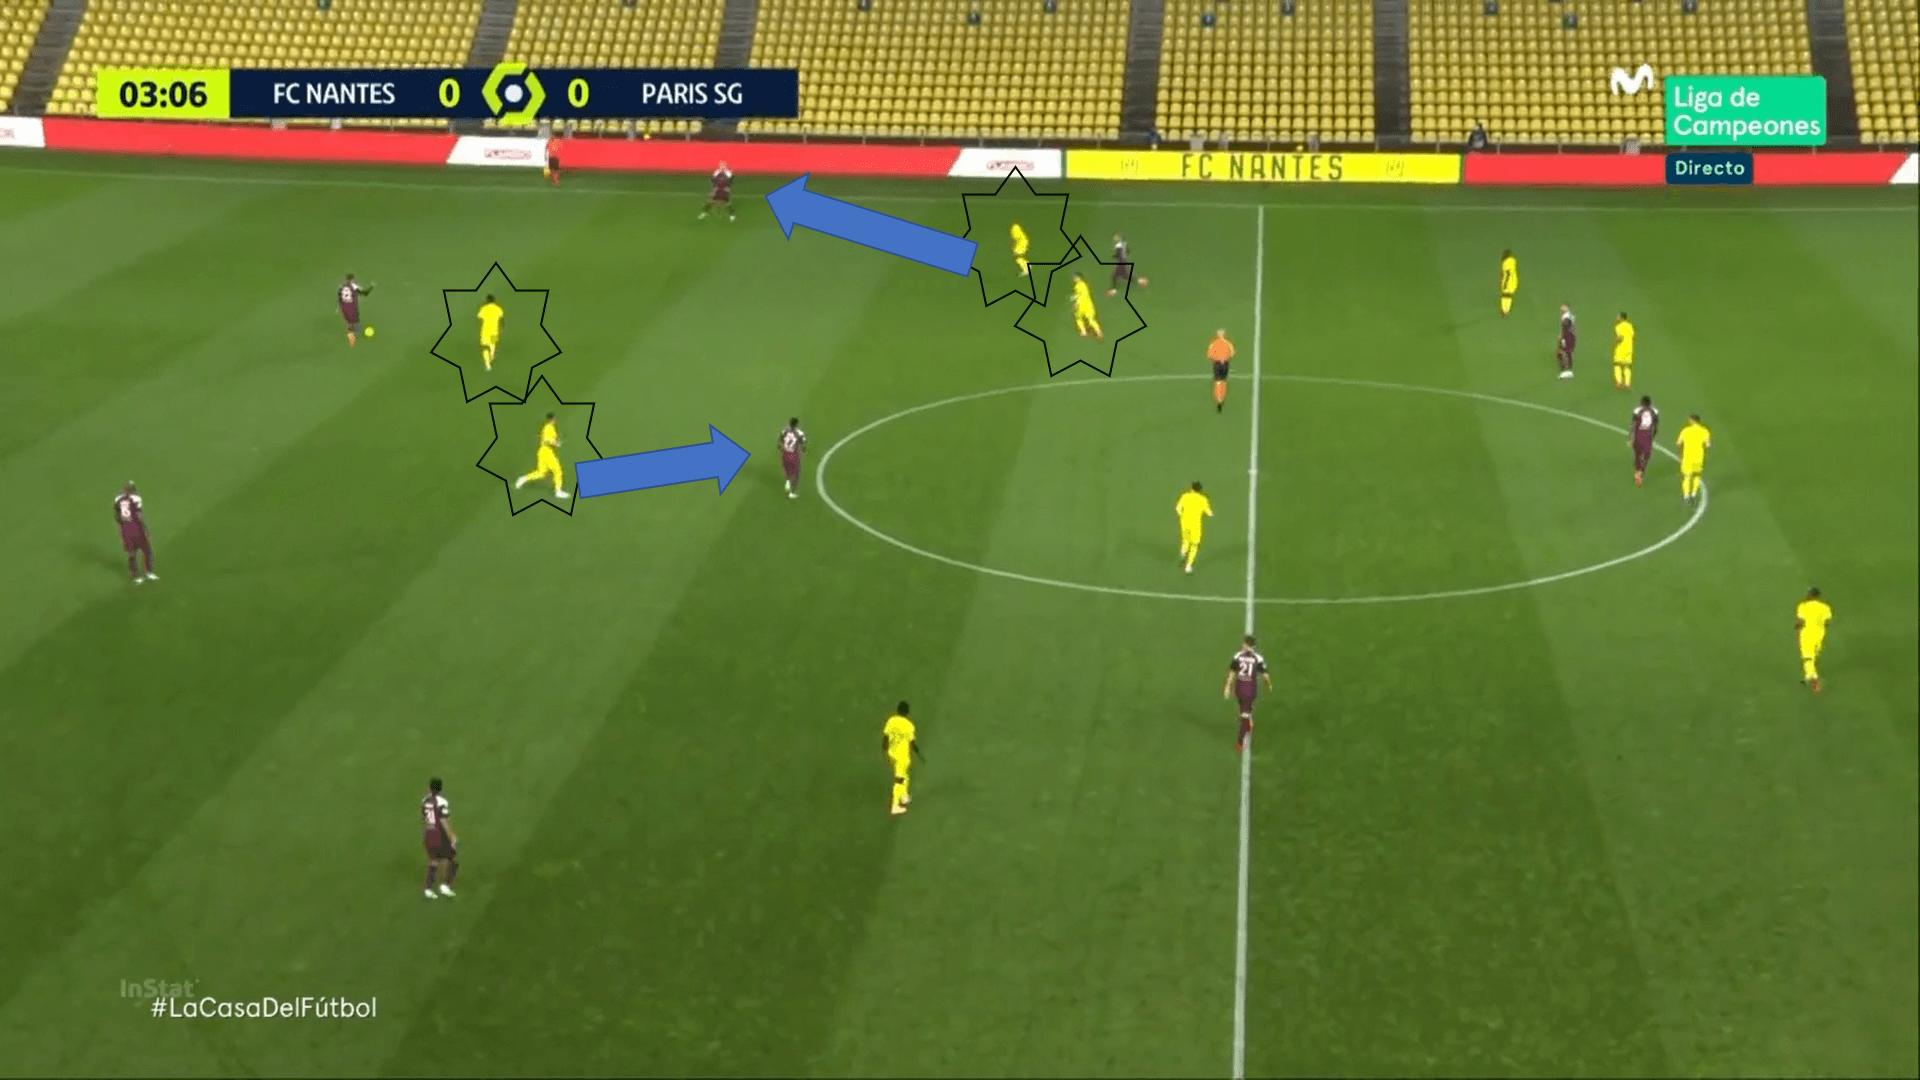 Ligue 1 2020/21: Nantes vs PSG - tactical analysis tactics